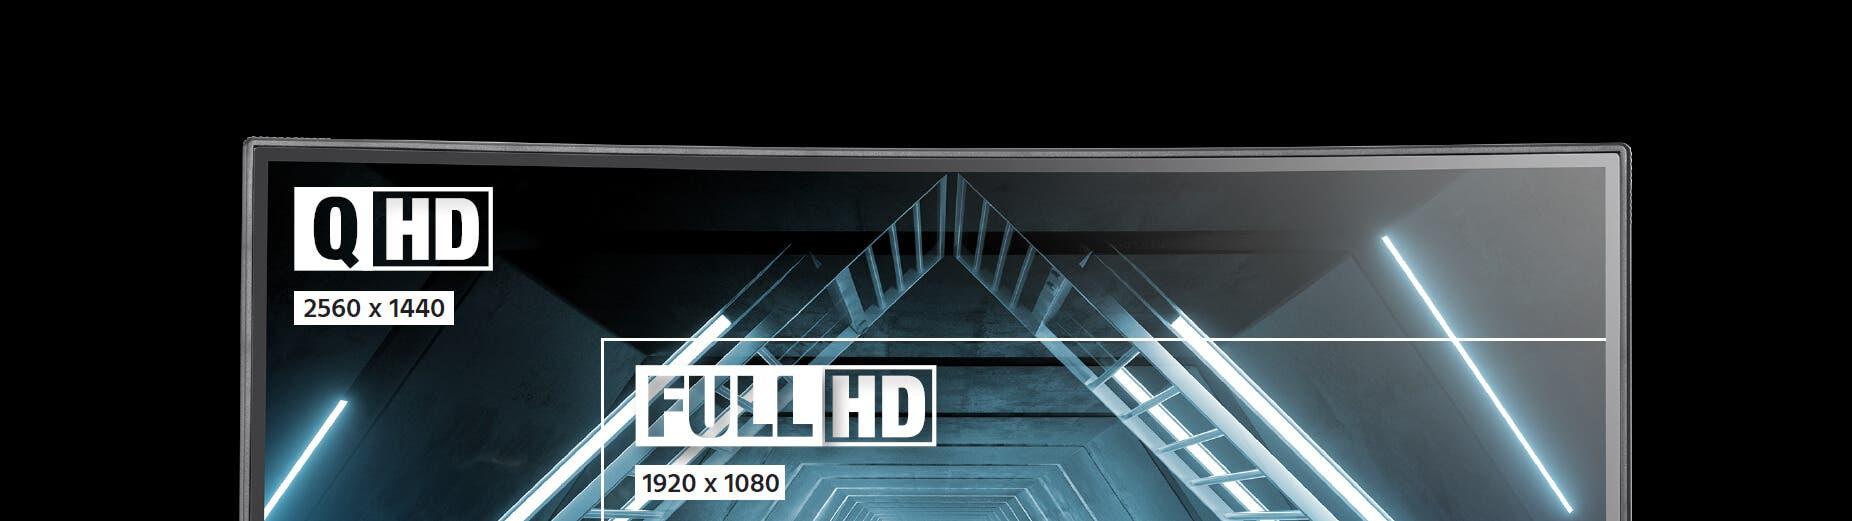 2560x1440 (QHD) RESOLUTION.